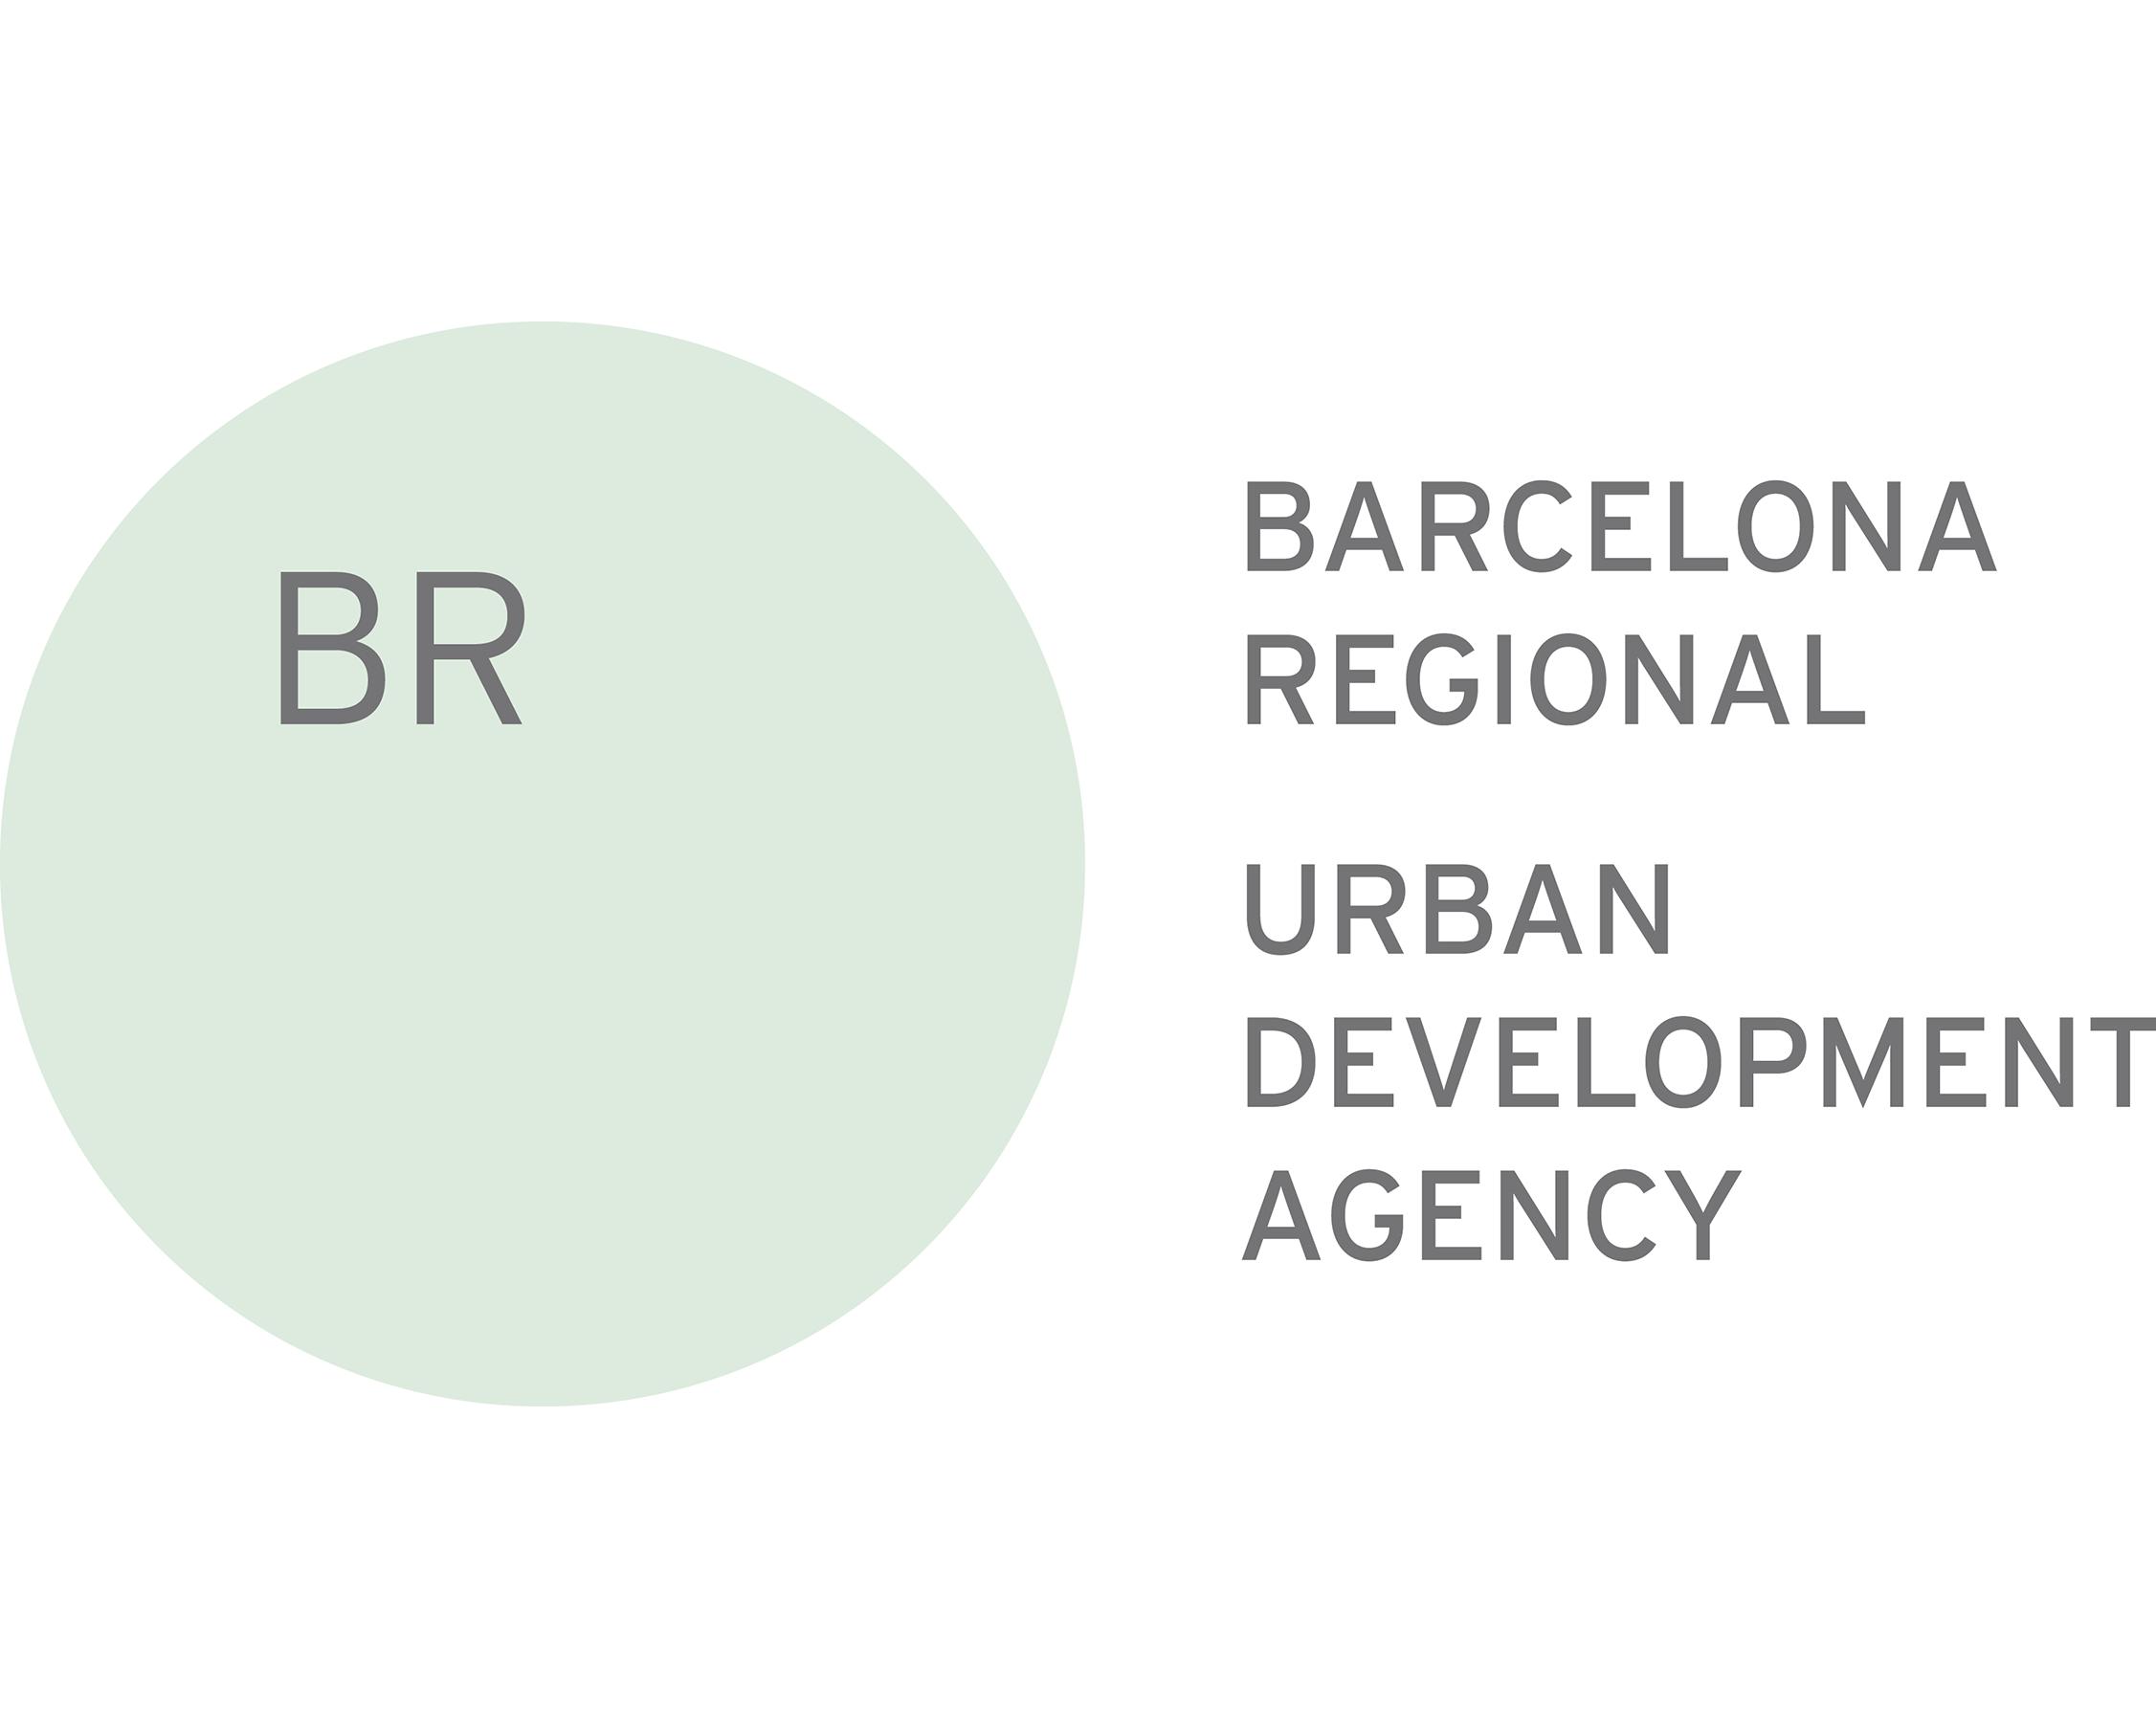 Barcelona Regional logo